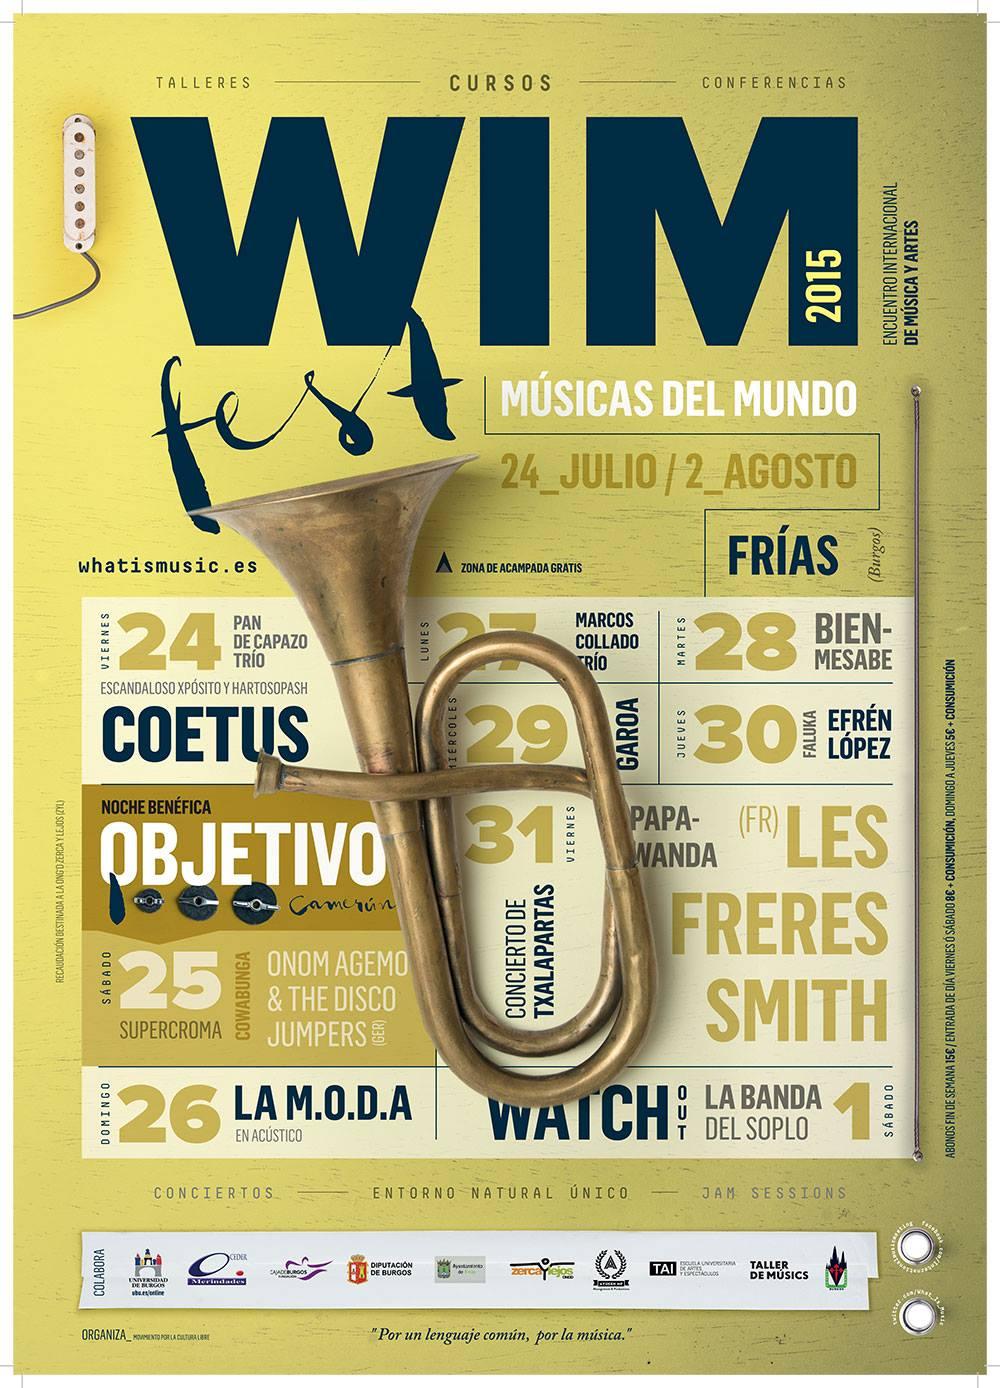 Papawanda en WIM – What is Music